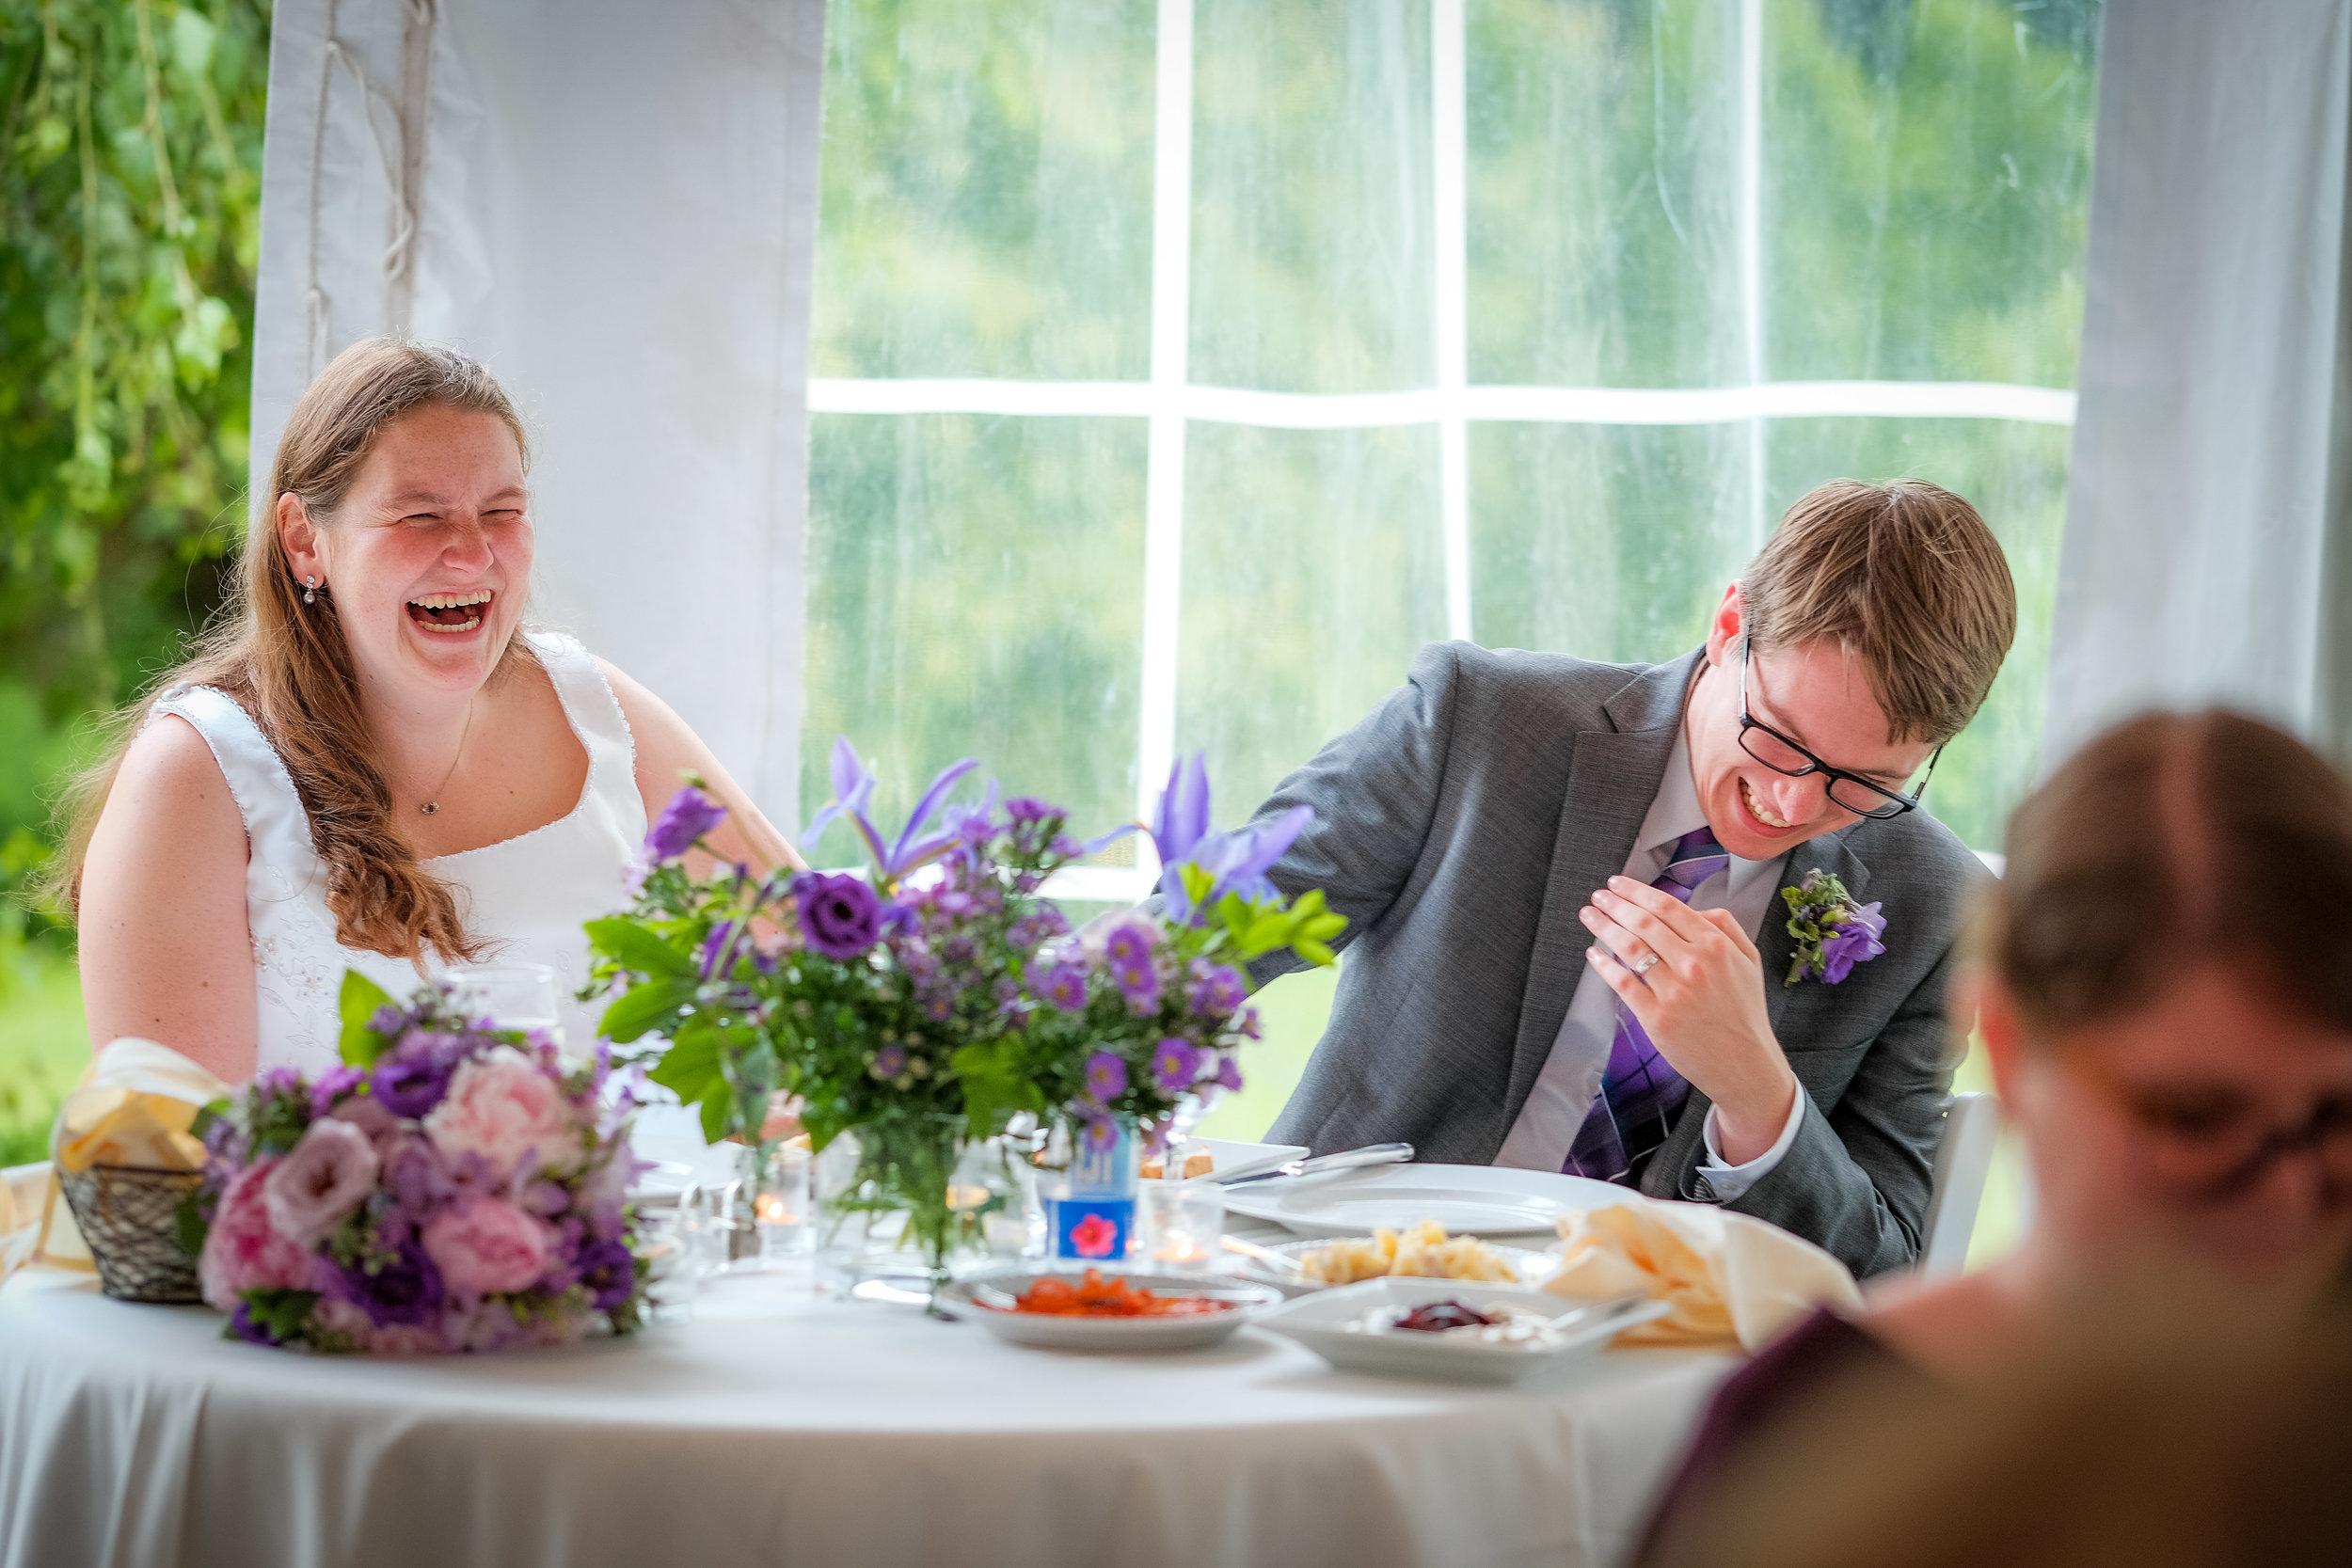 Vermont-Lilac-Inn-Wedding-Photography-975.jpg